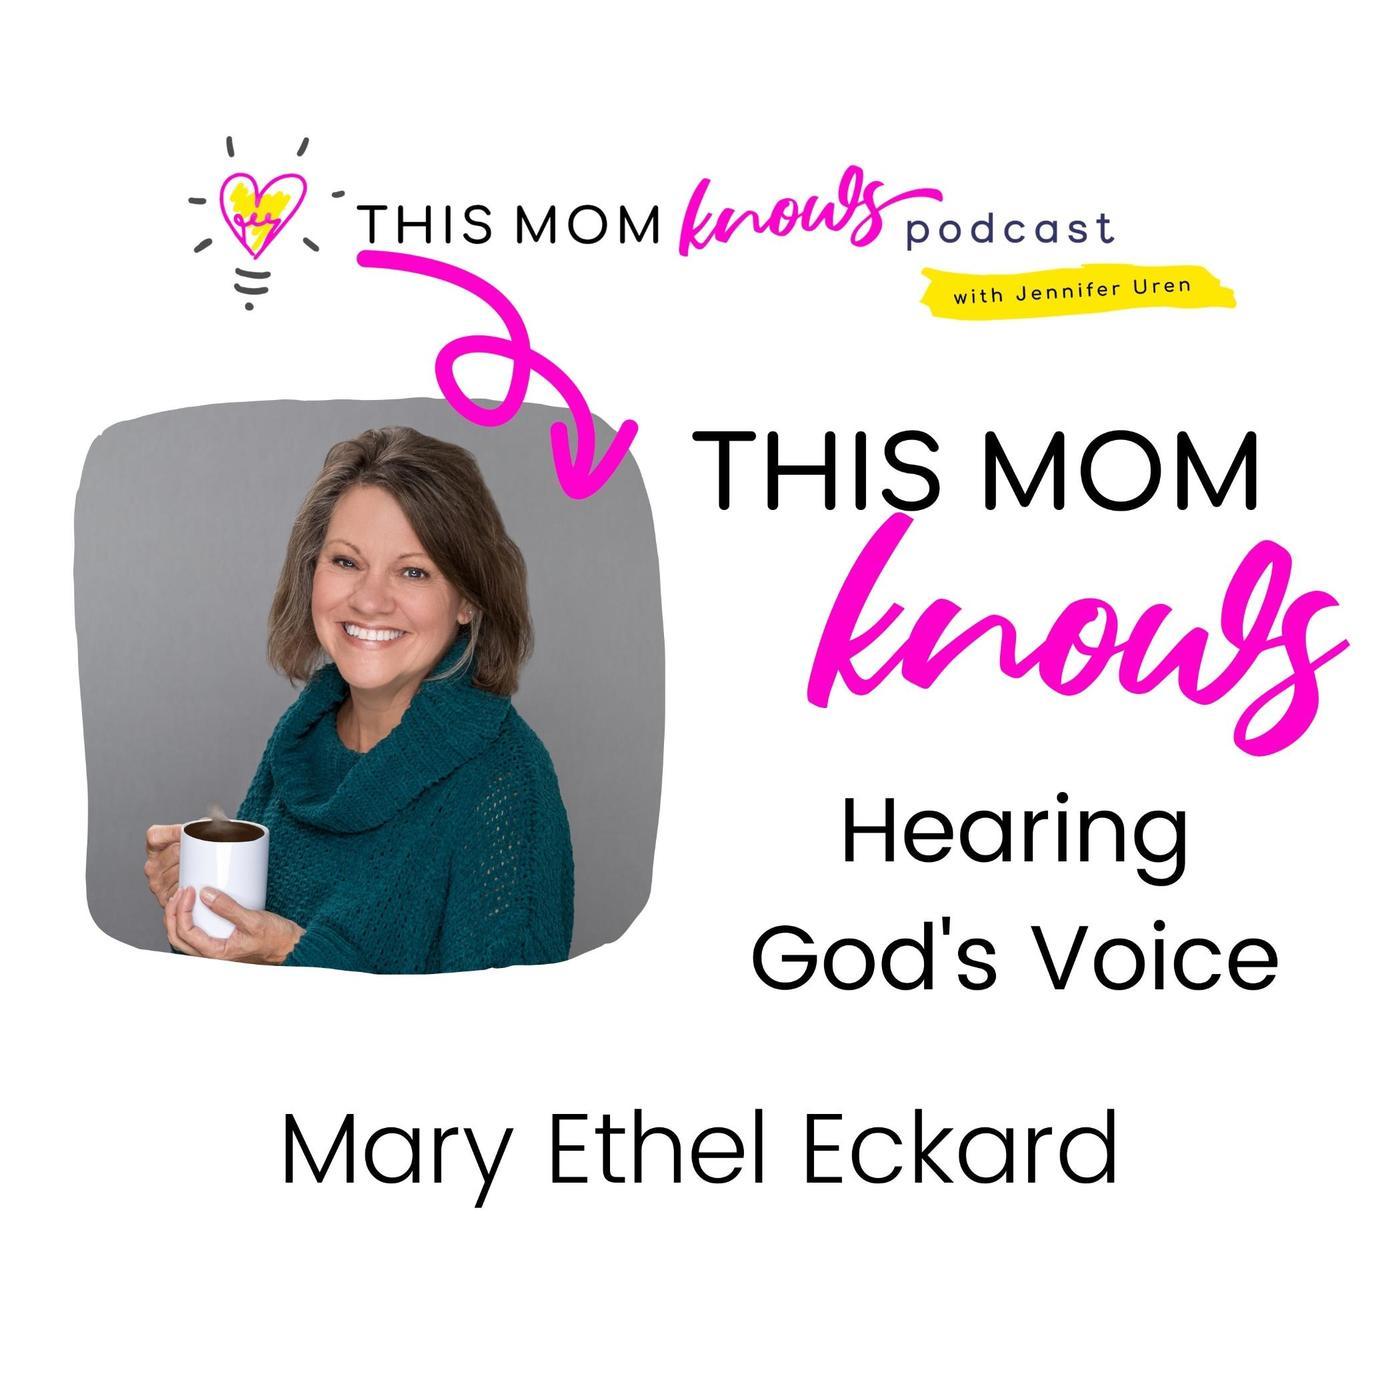 Mary Eckard on Hearing God's Voice